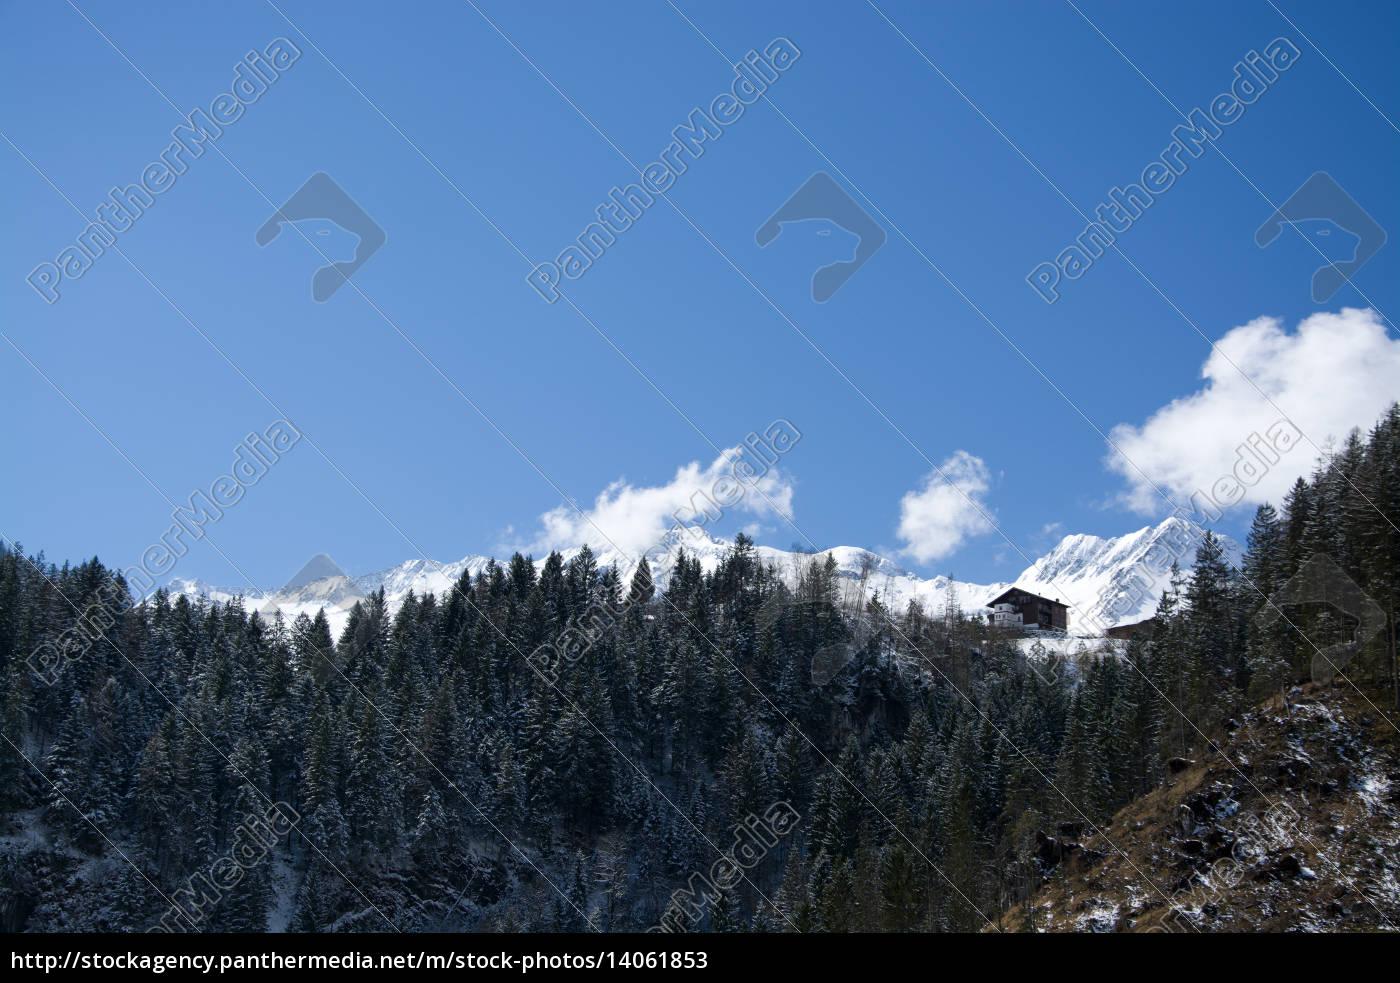 pinzgau, austria - 14061853